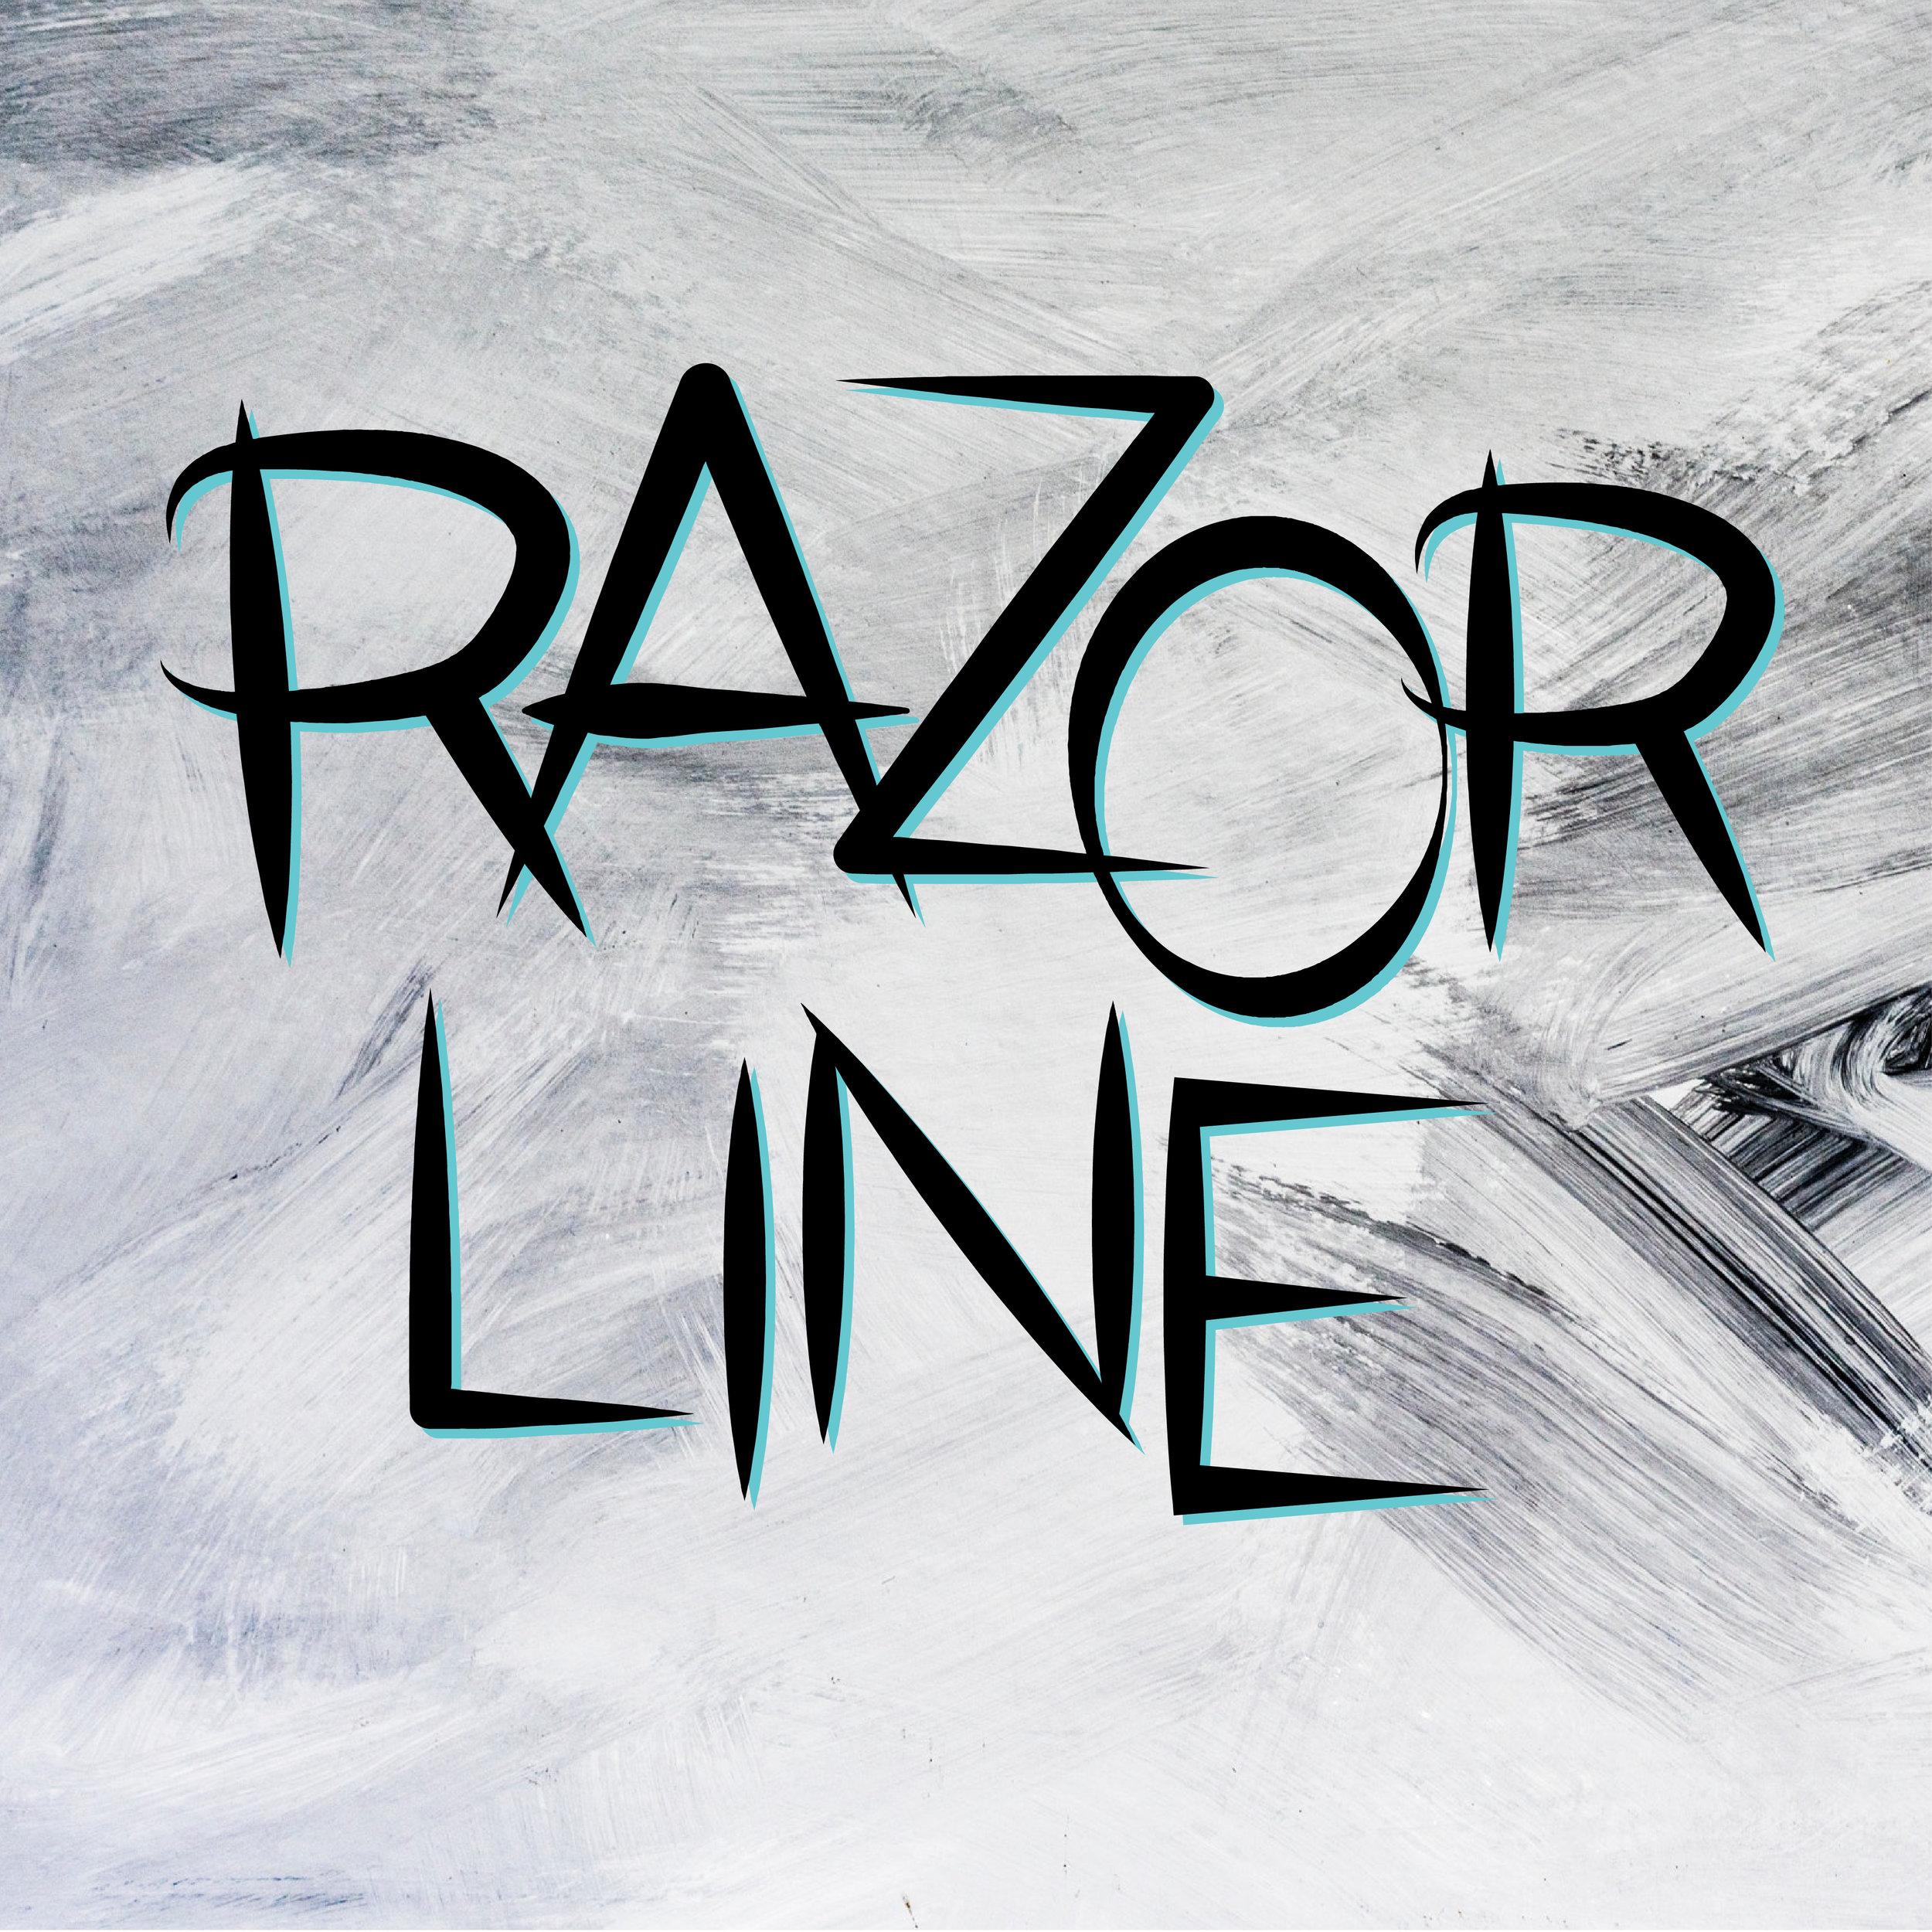 RazorLine.jpg